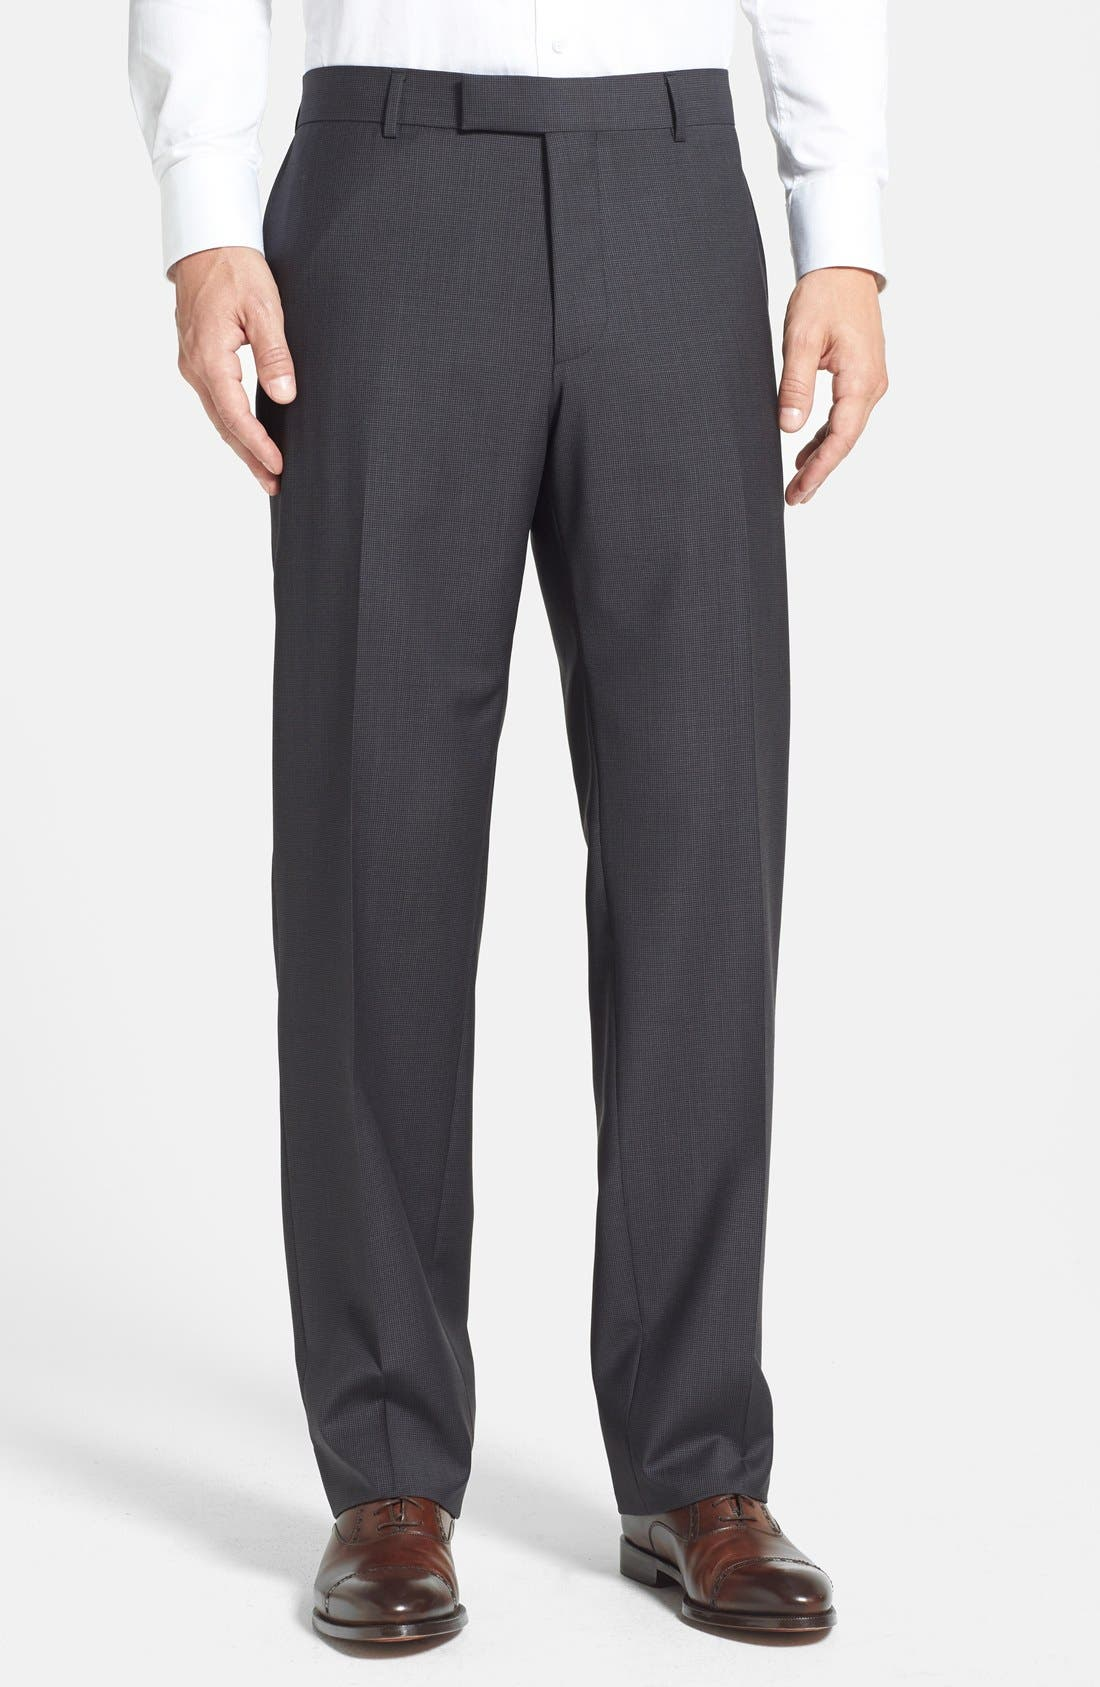 Alternate Image 1 Selected - BOSS HUGO BOSS 'Jeffrey' Flat Front Trousers